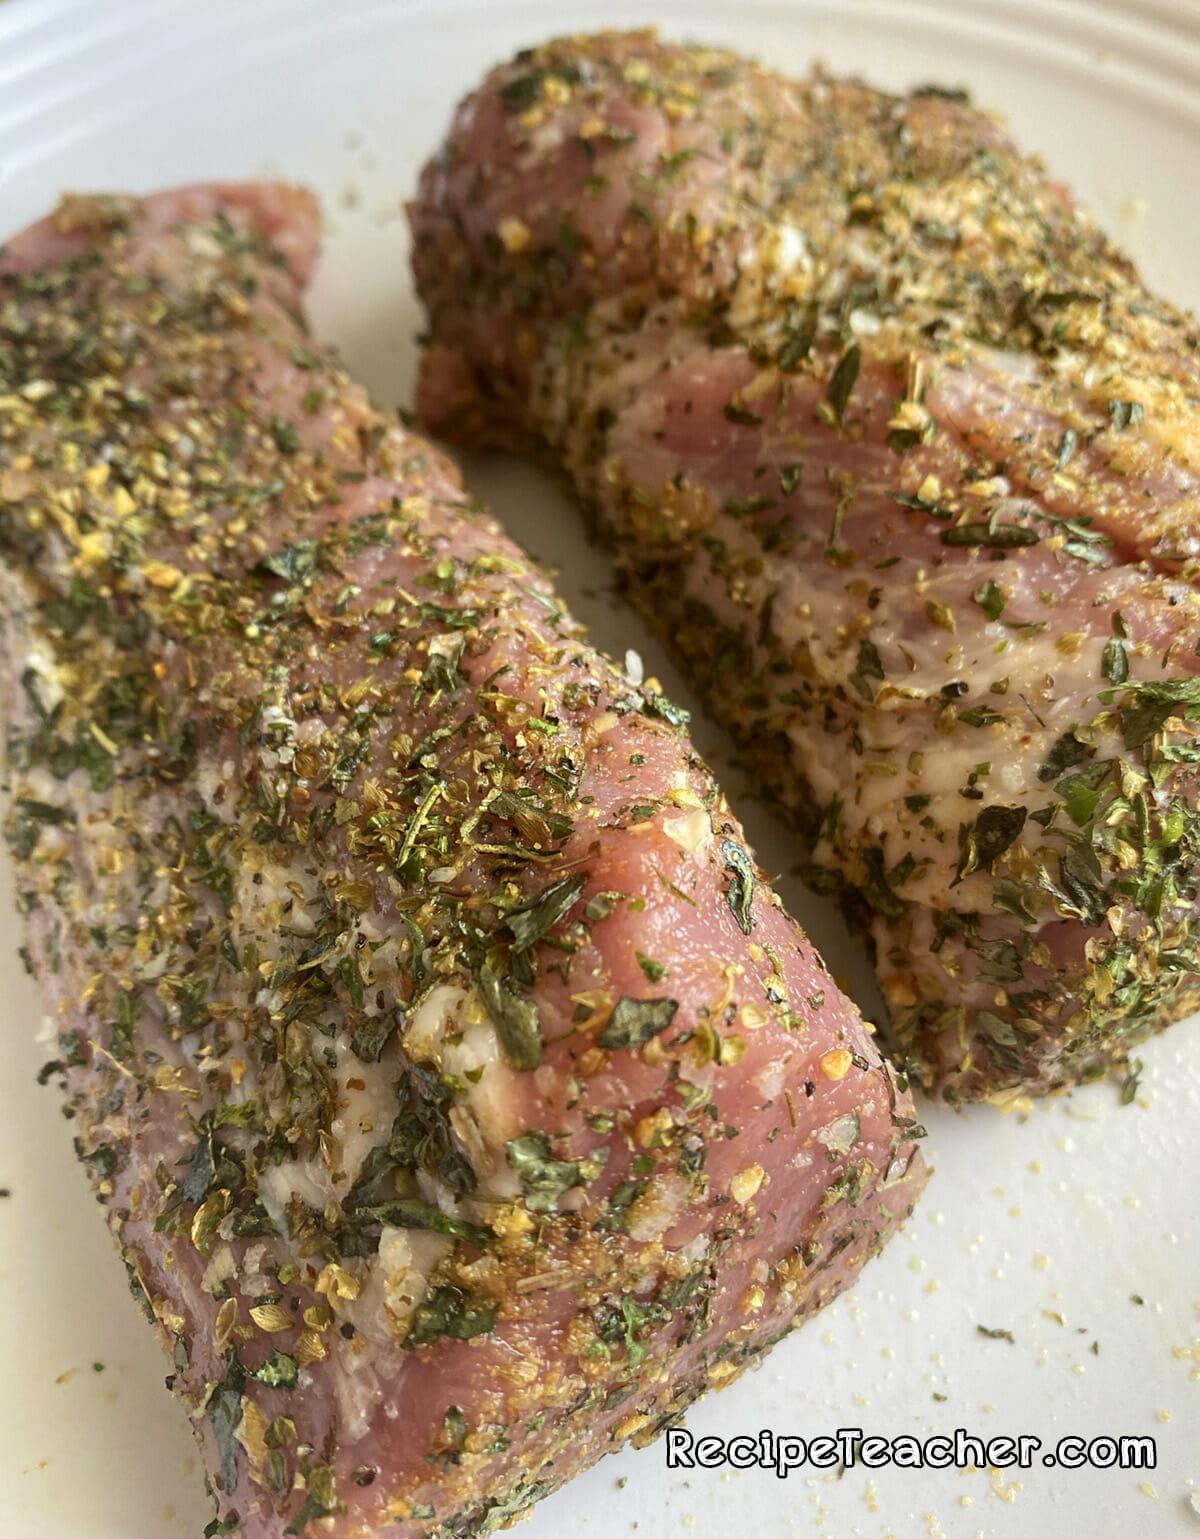 Recipe for Instant Pot garlic and herb pork tenderloin